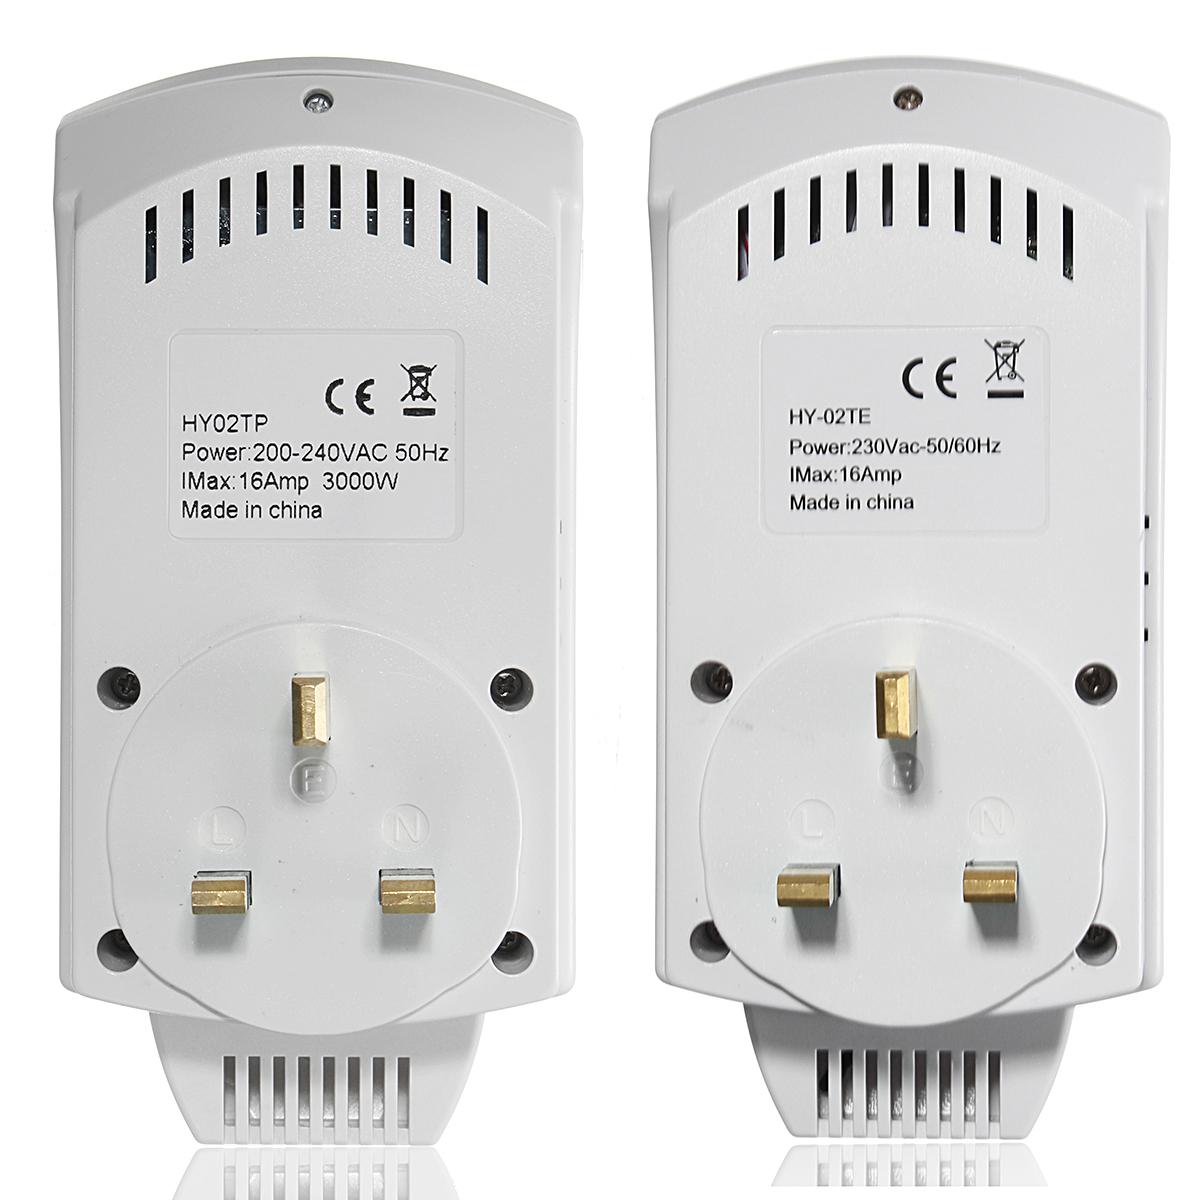 honeywell temperature controller instructions